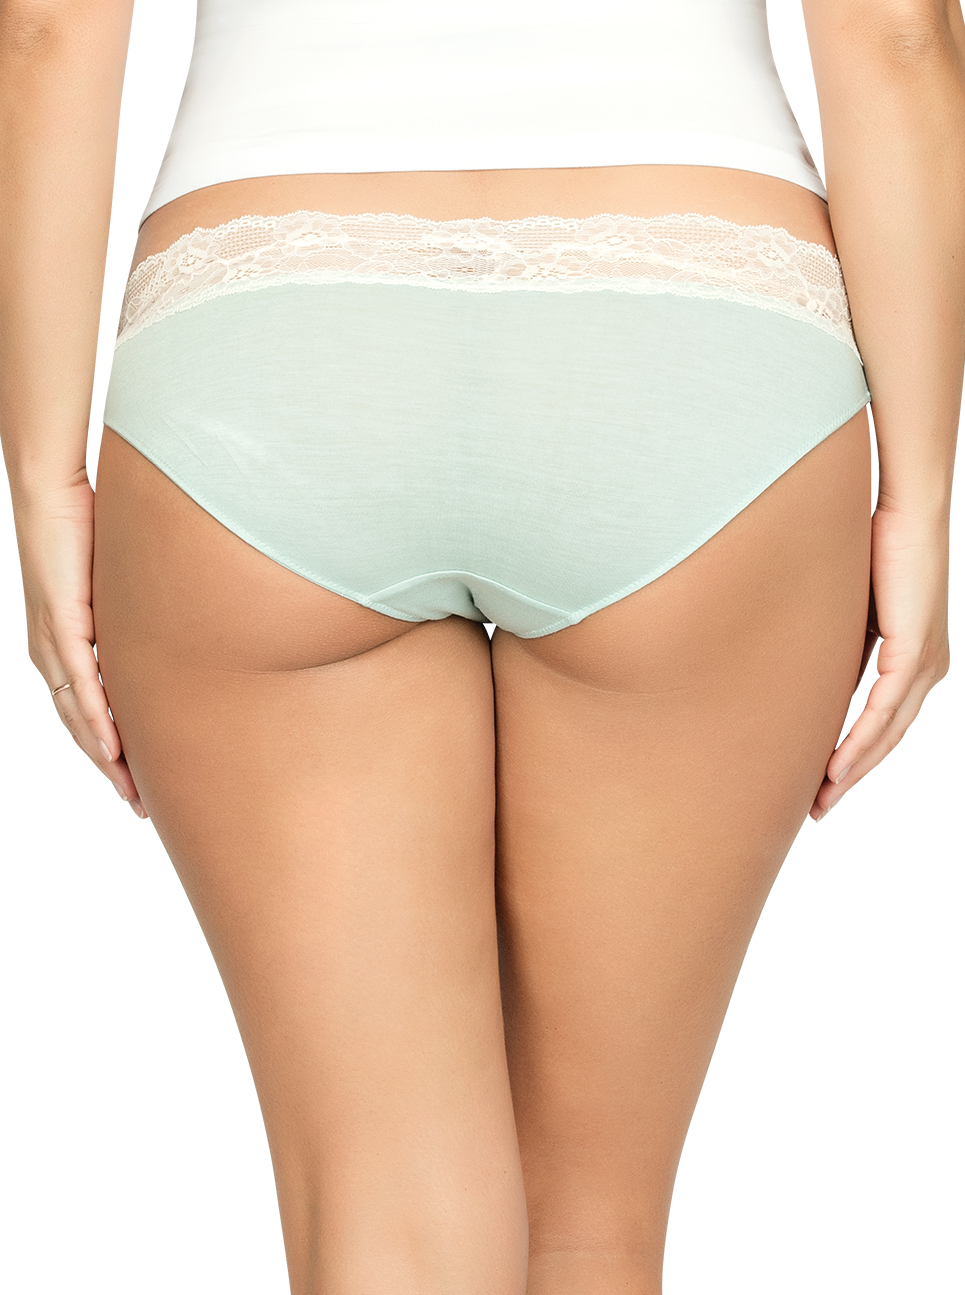 ParfaitPanty SoEssential BikiniPP303 Surf Back - Panty So Essential Bikini- Surf - PP303